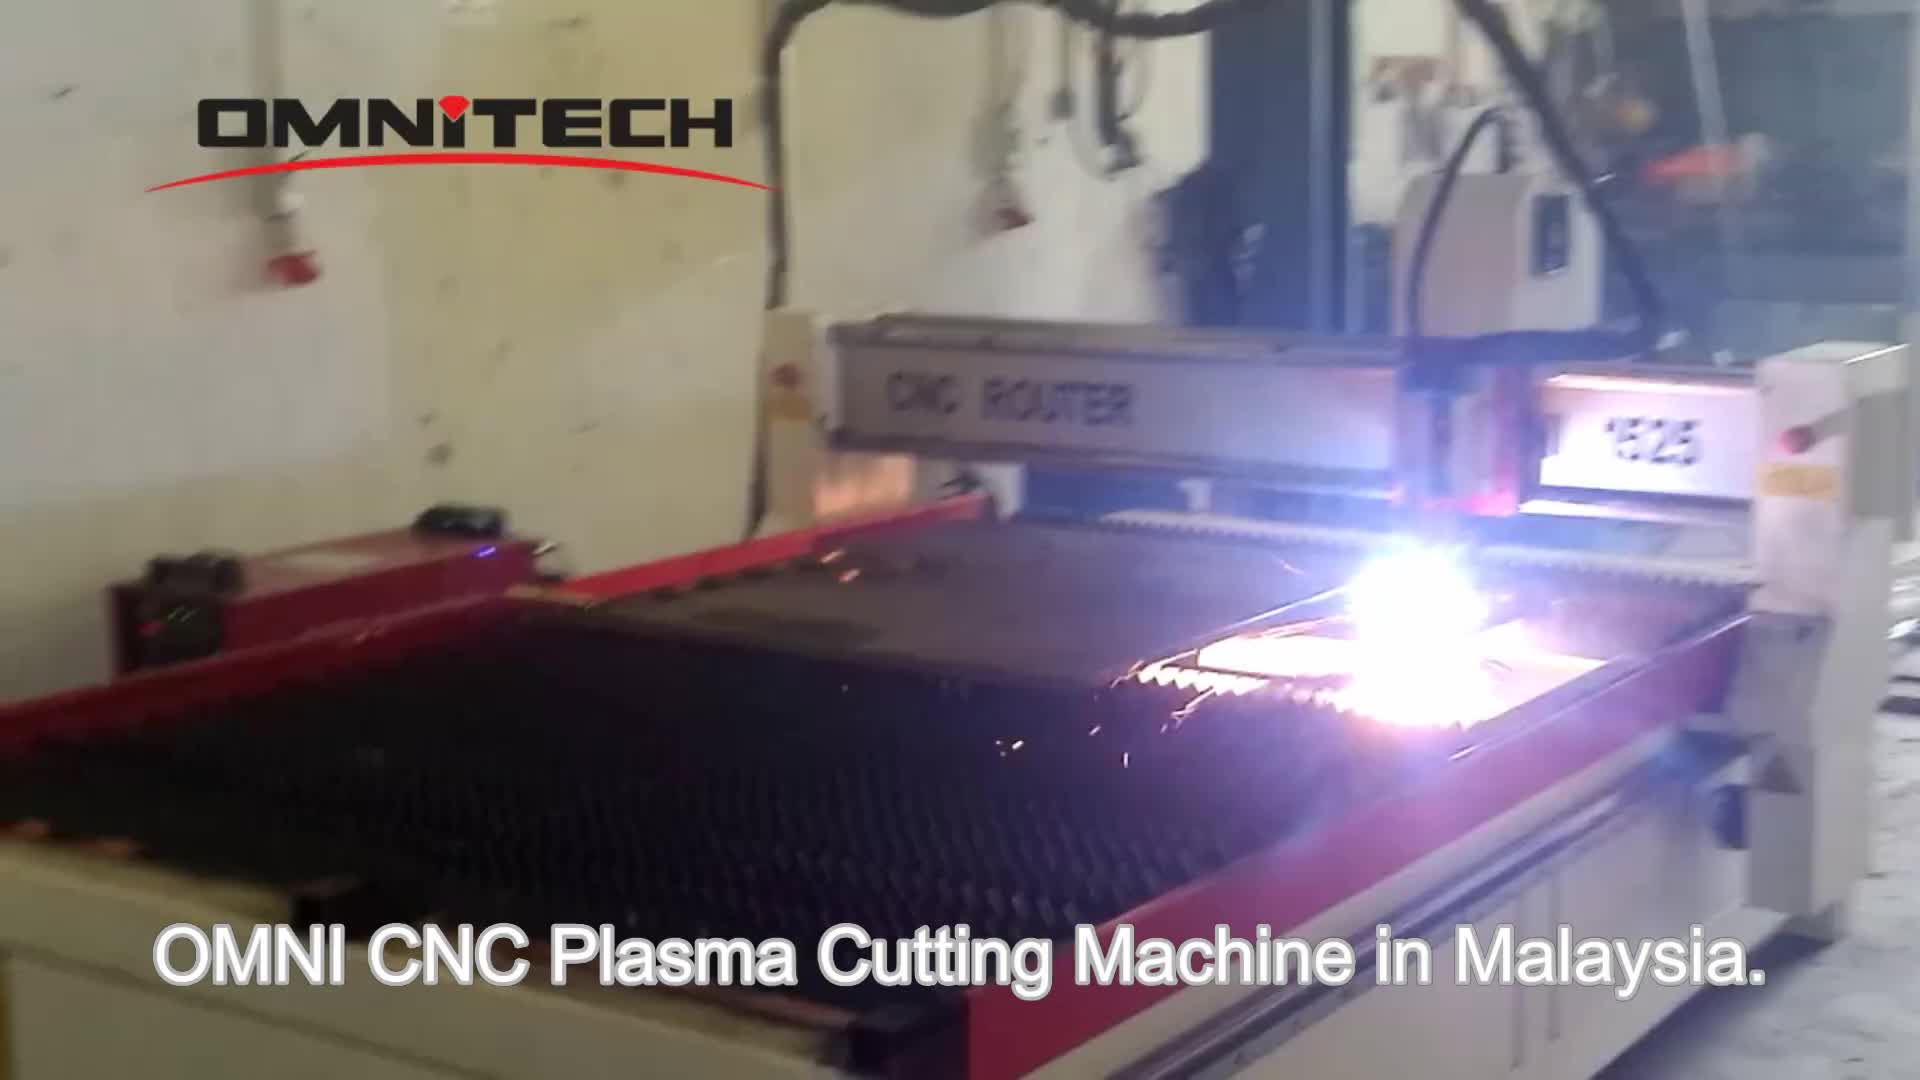 CNC Plasma Cutting Table 5x10 ft, with ESAB esp-100i ... |Used Cnc Plasma Cutting Tables